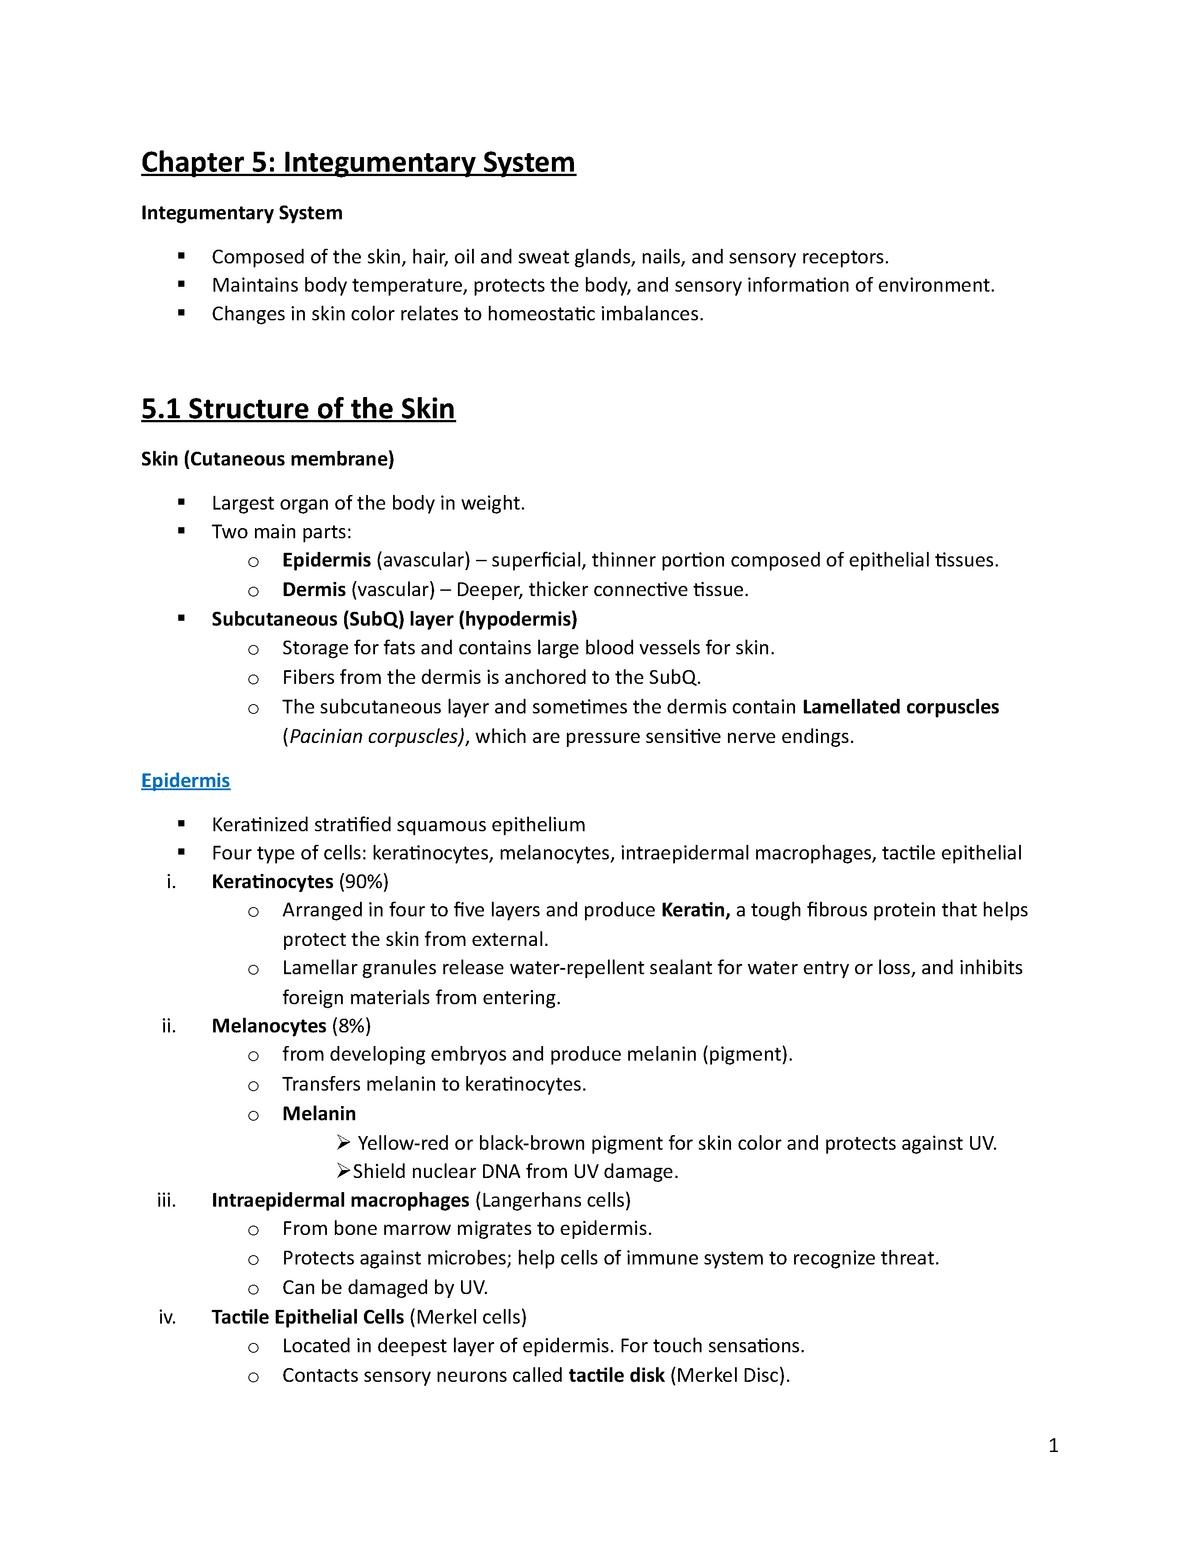 Chapter 5 Integumentary - Biol 235 - StuDocu